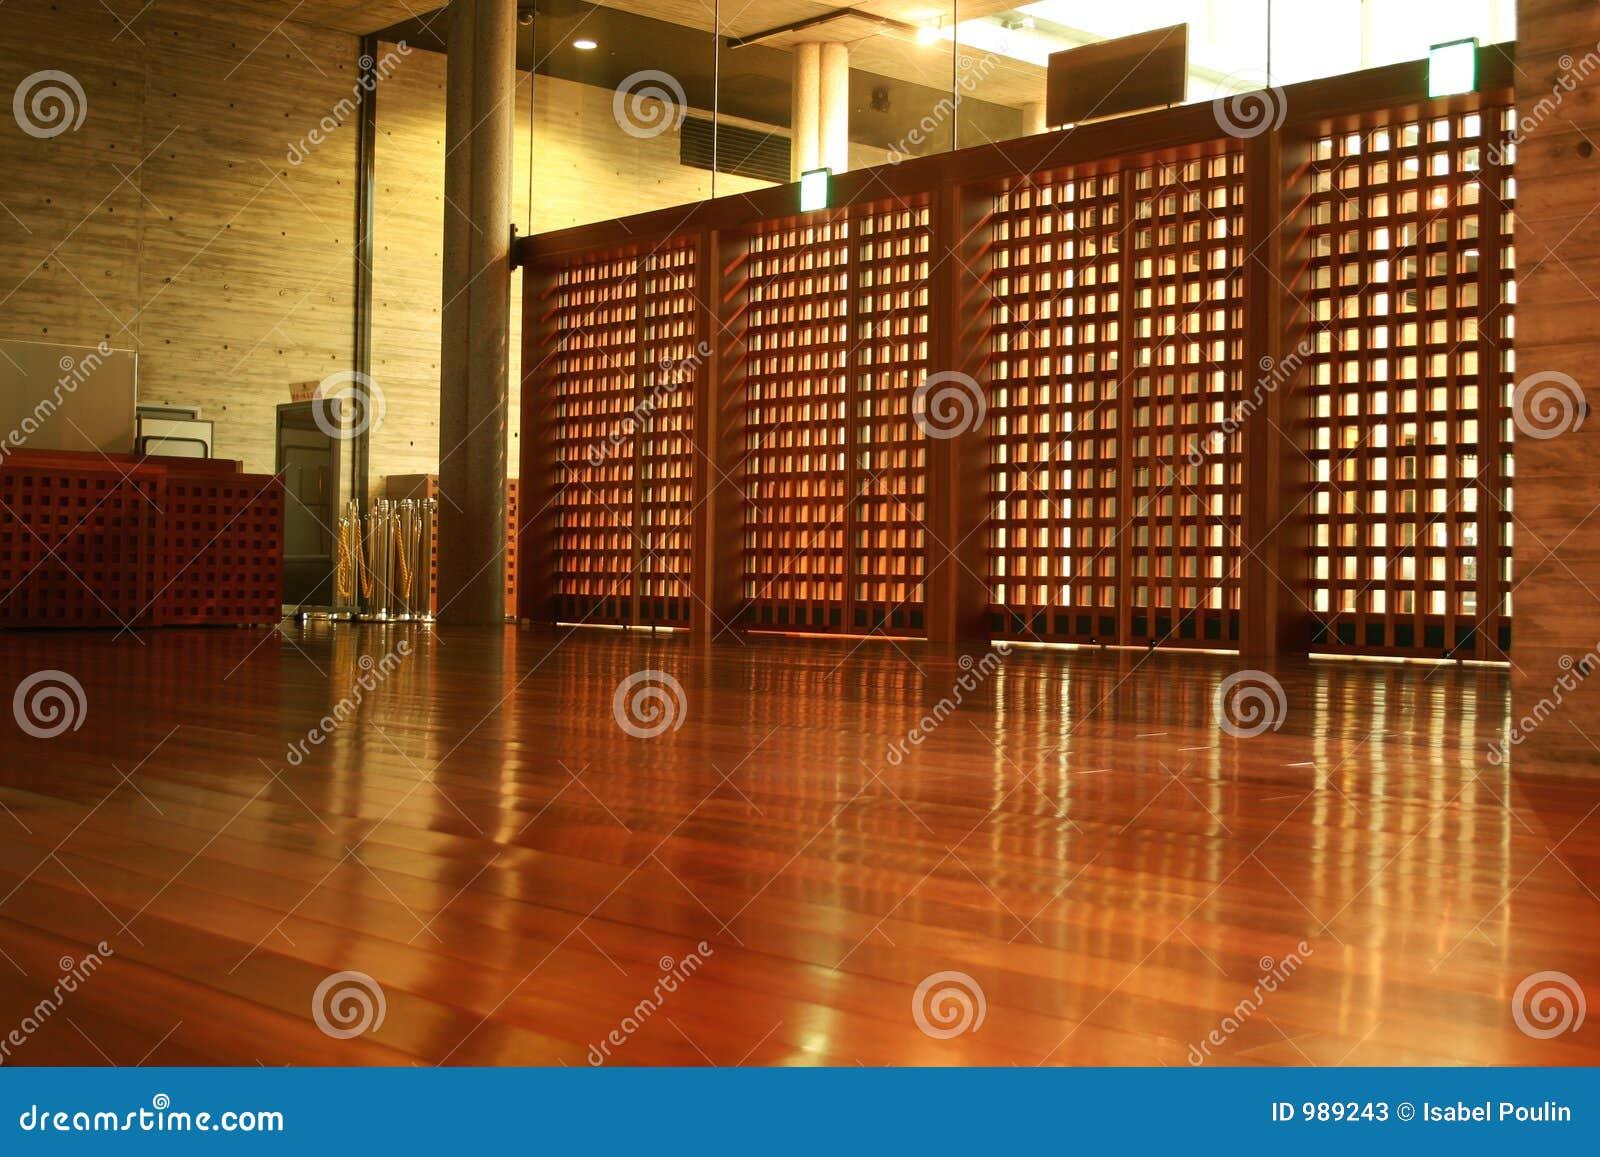 architecture japonaise photos stock image 989243. Black Bedroom Furniture Sets. Home Design Ideas